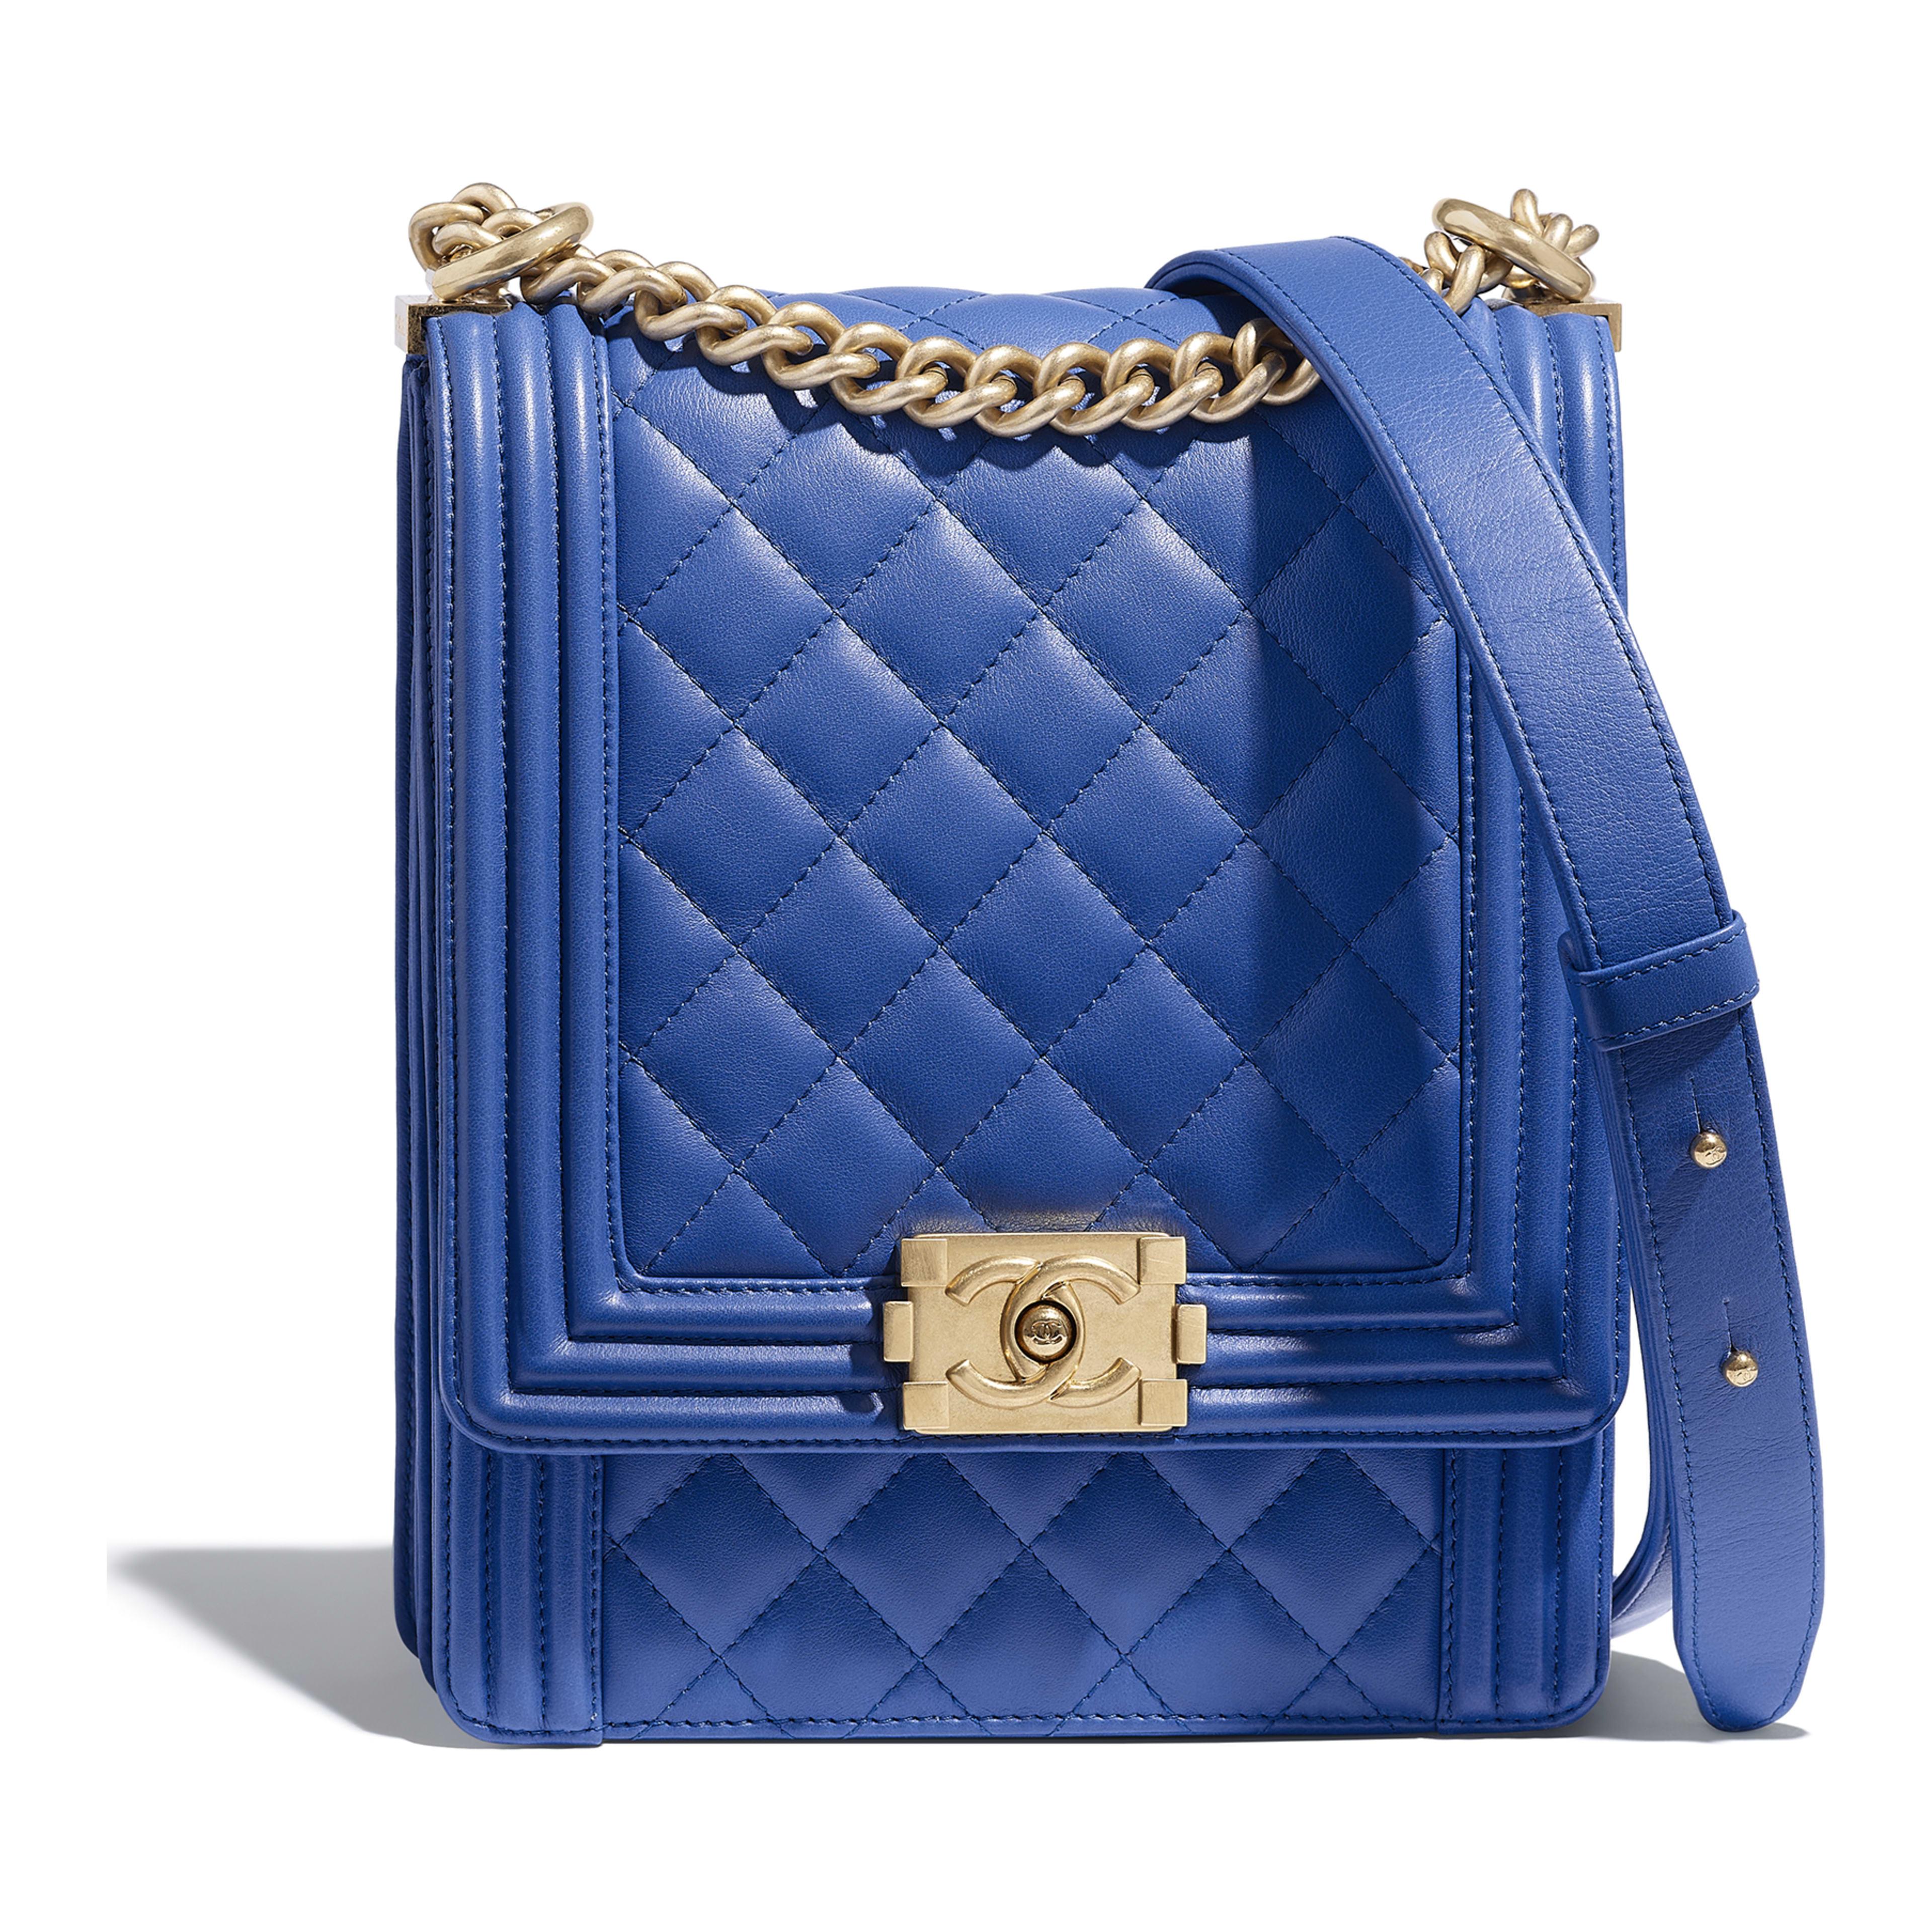 Boy Chanel Handbag Calfskin Gold Tone Metal